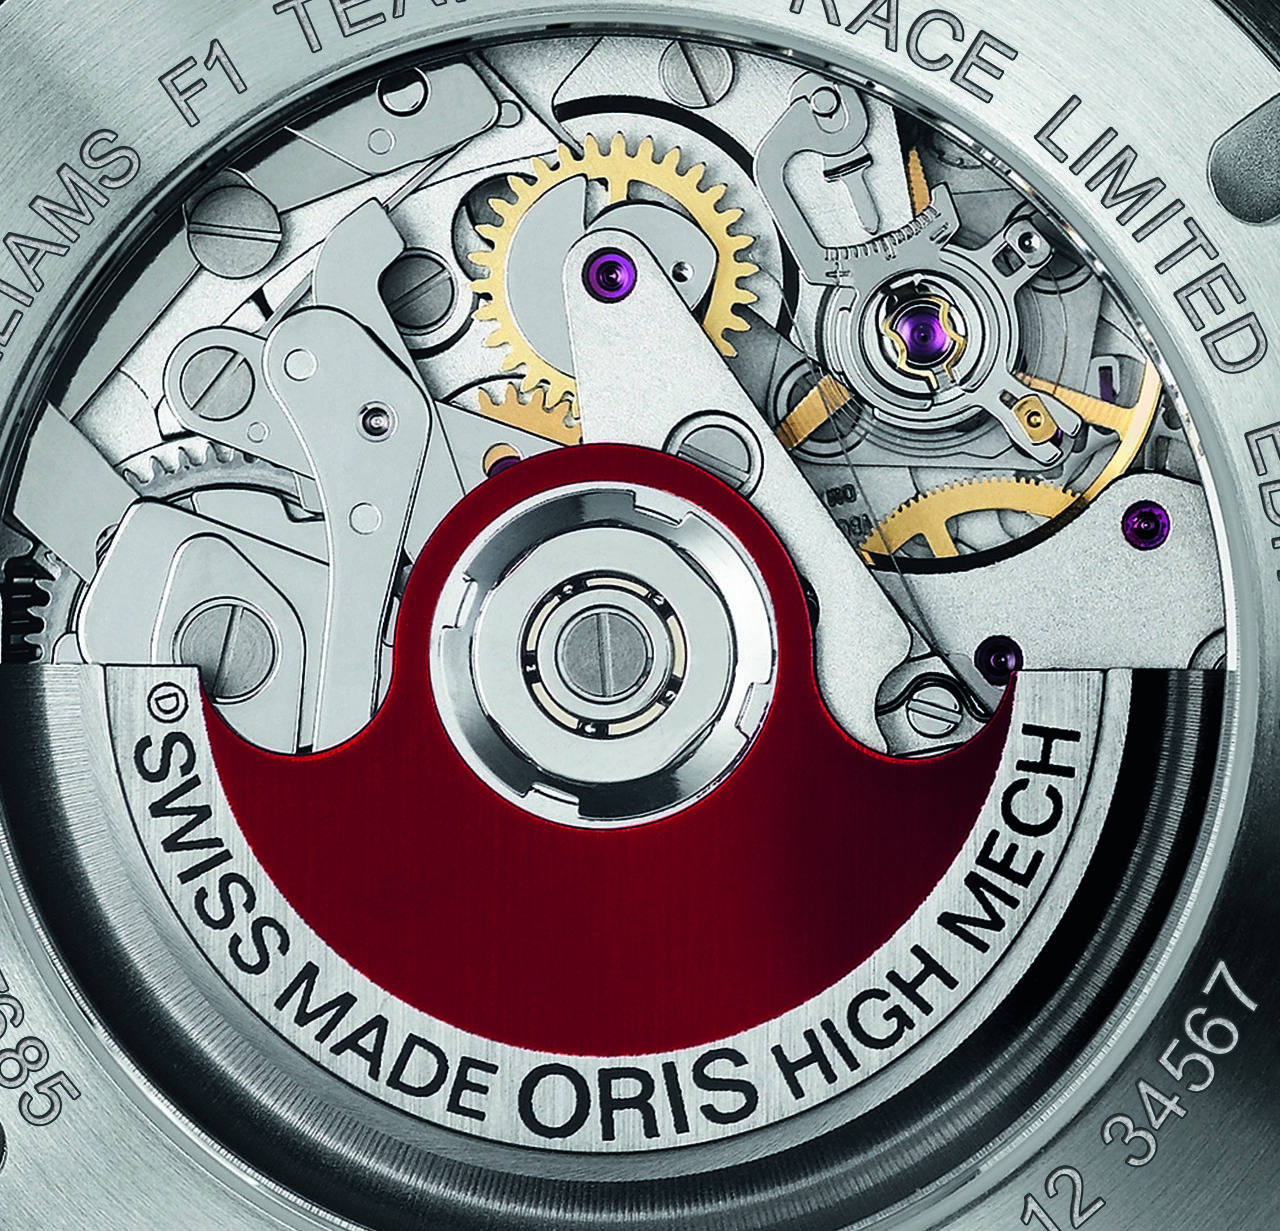 oris-williams-f1-team-600th-race-limited-edition_0-100_7